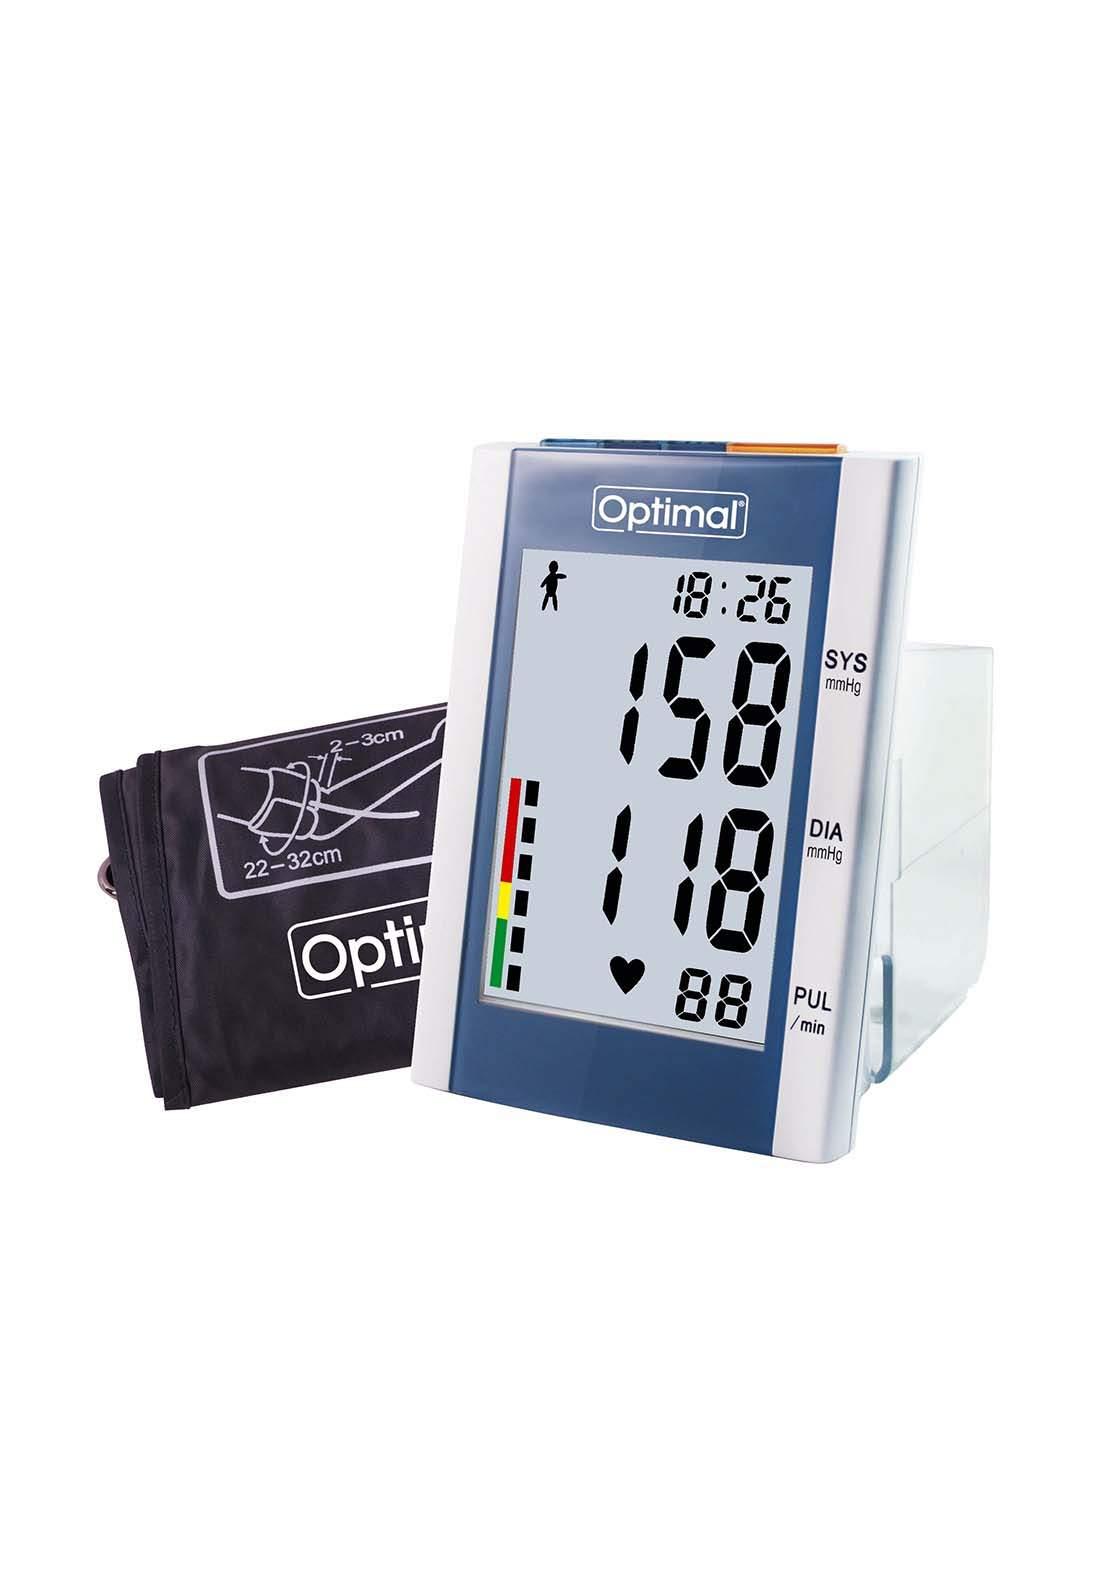 Optimal Arm Type Digital Blood Pressure Monitor  جهاز قياس ضغط الدم الرقمي للذراع